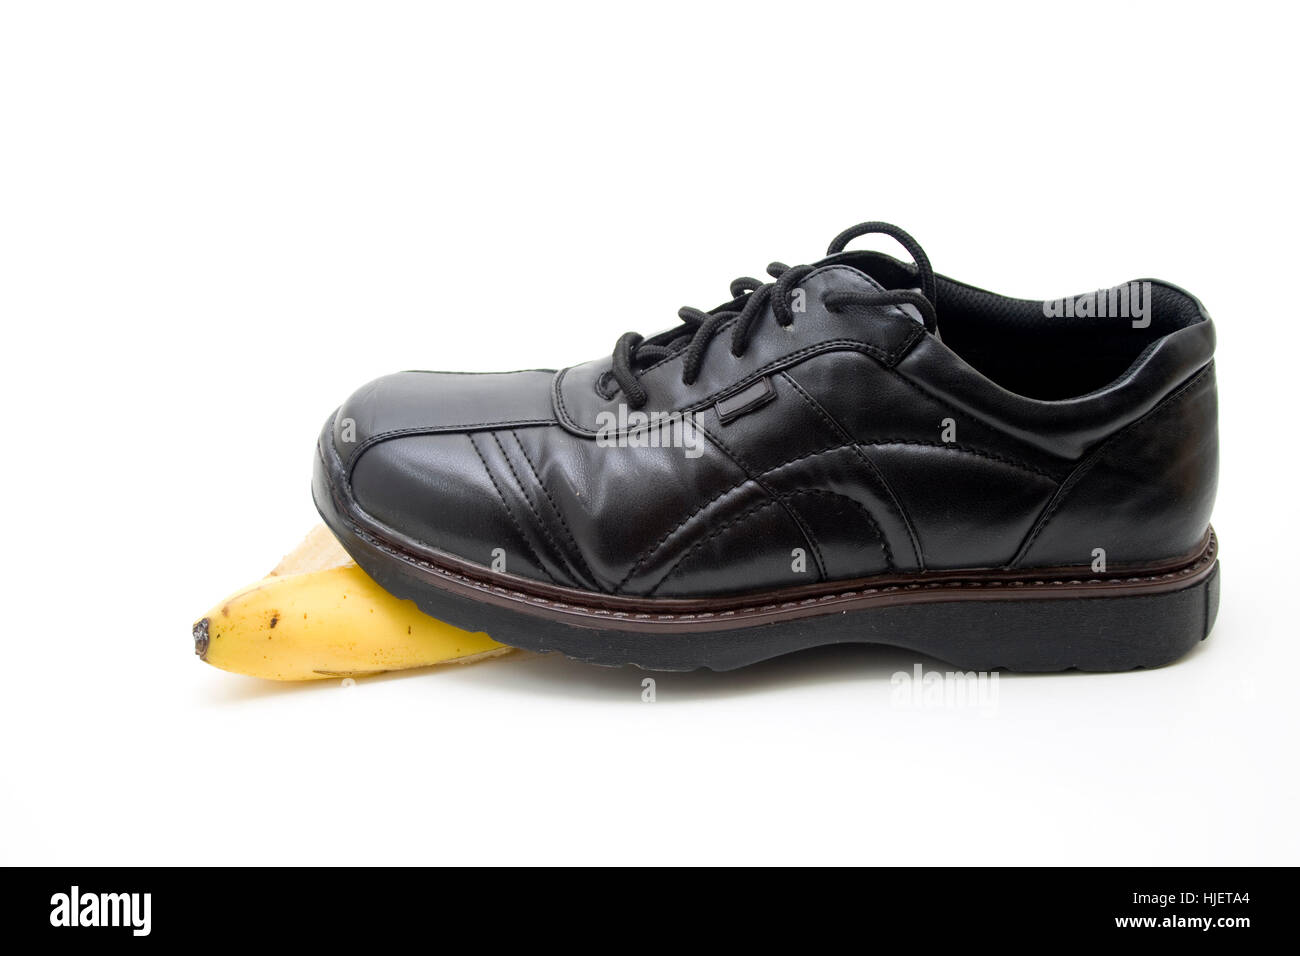 shoestring shoe - Stock Image